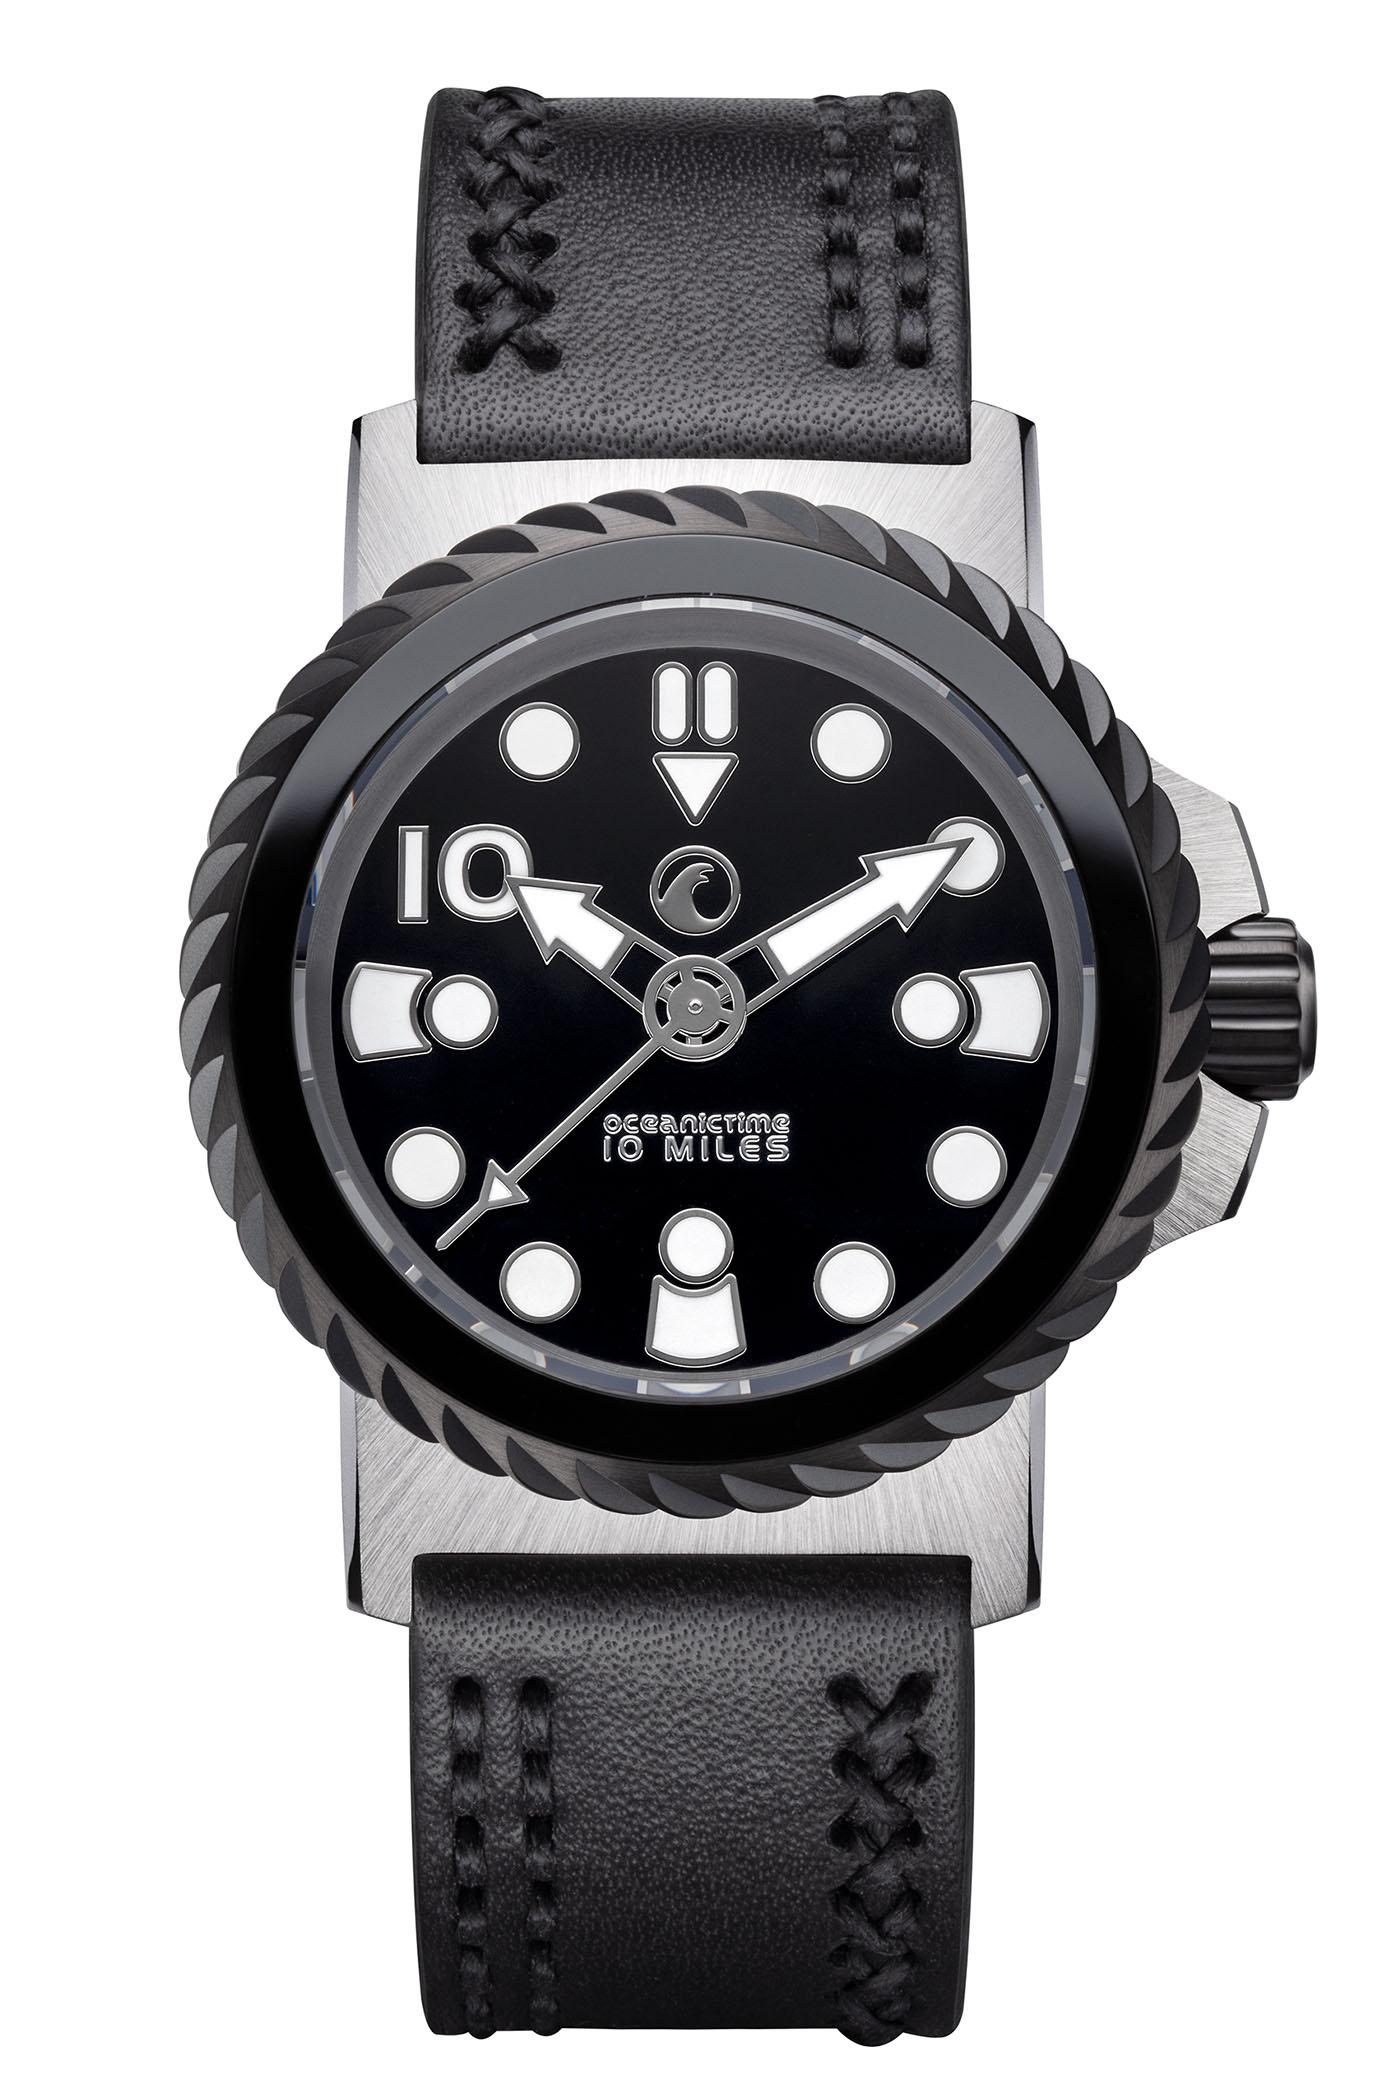 H2O Watch Kalmar 10 Miles - 7